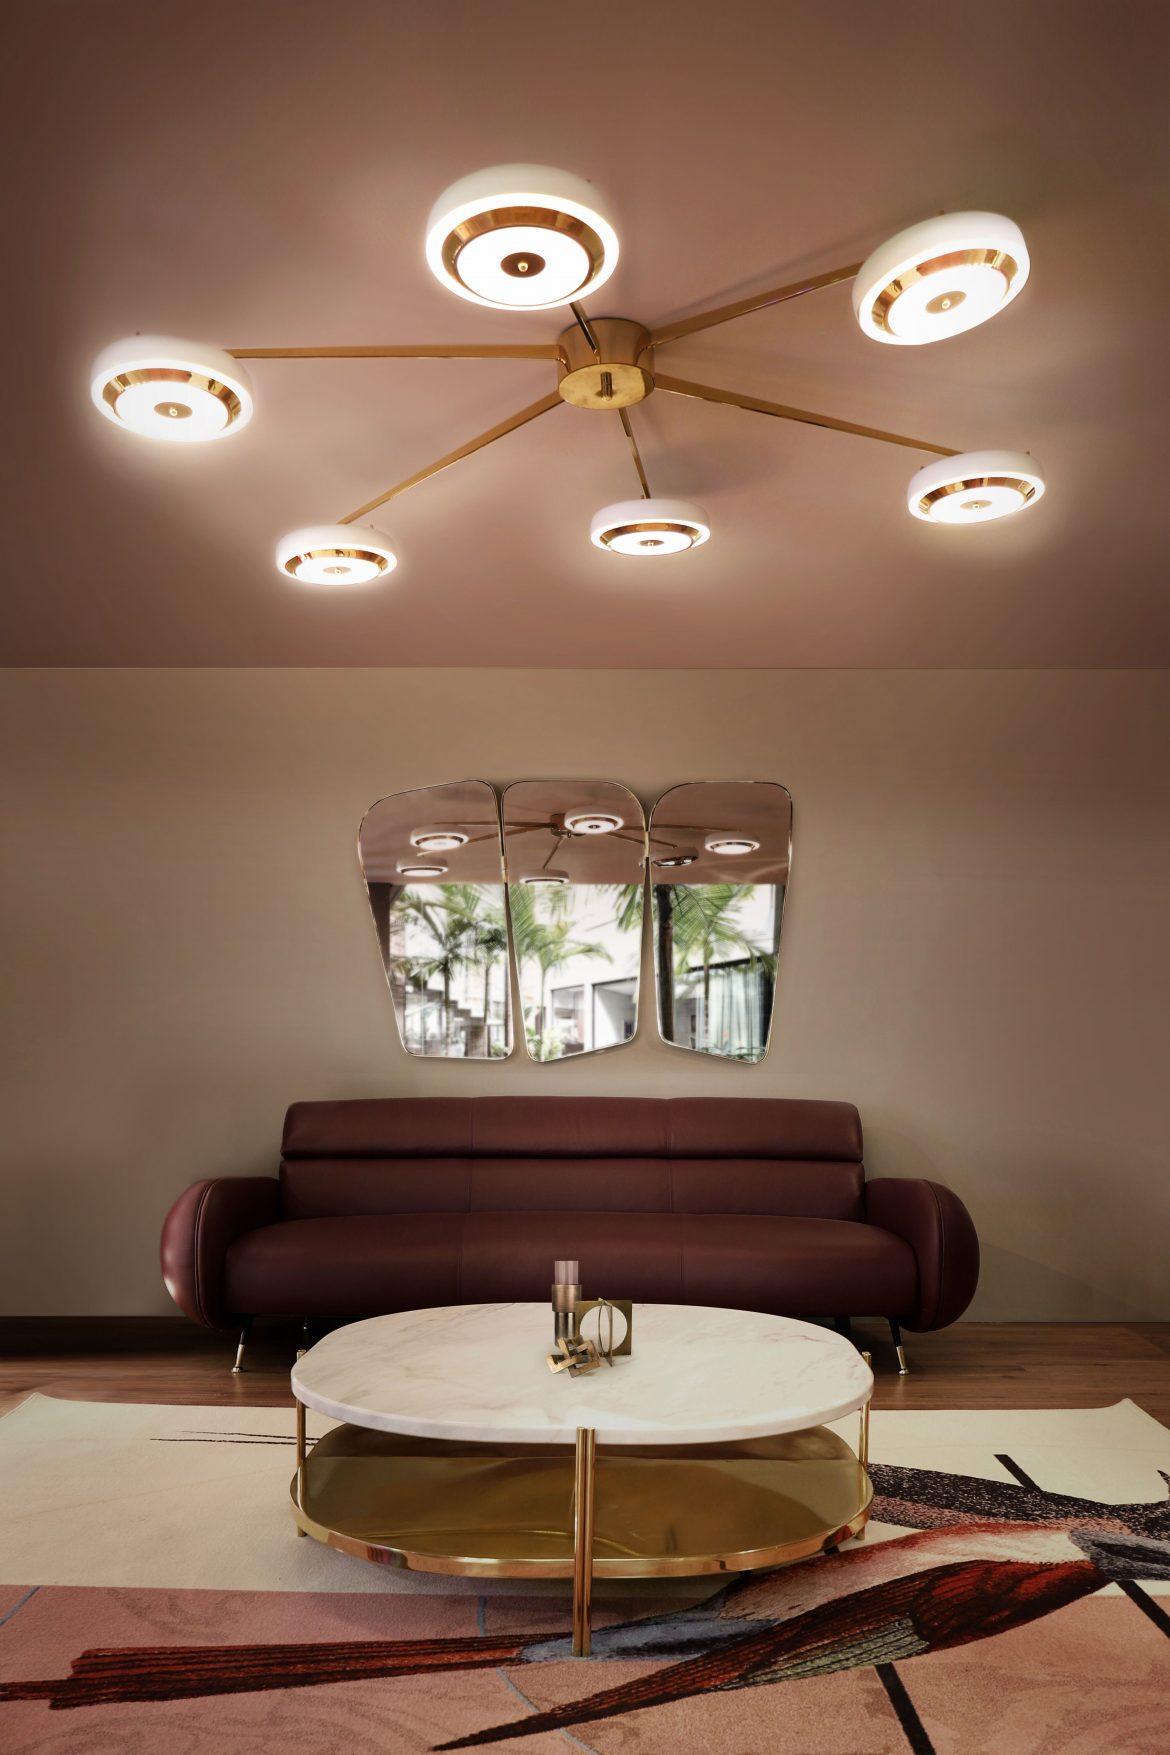 living room ideas 30 Best Living Room Ideas For 2020 best living room ideas 2020 24